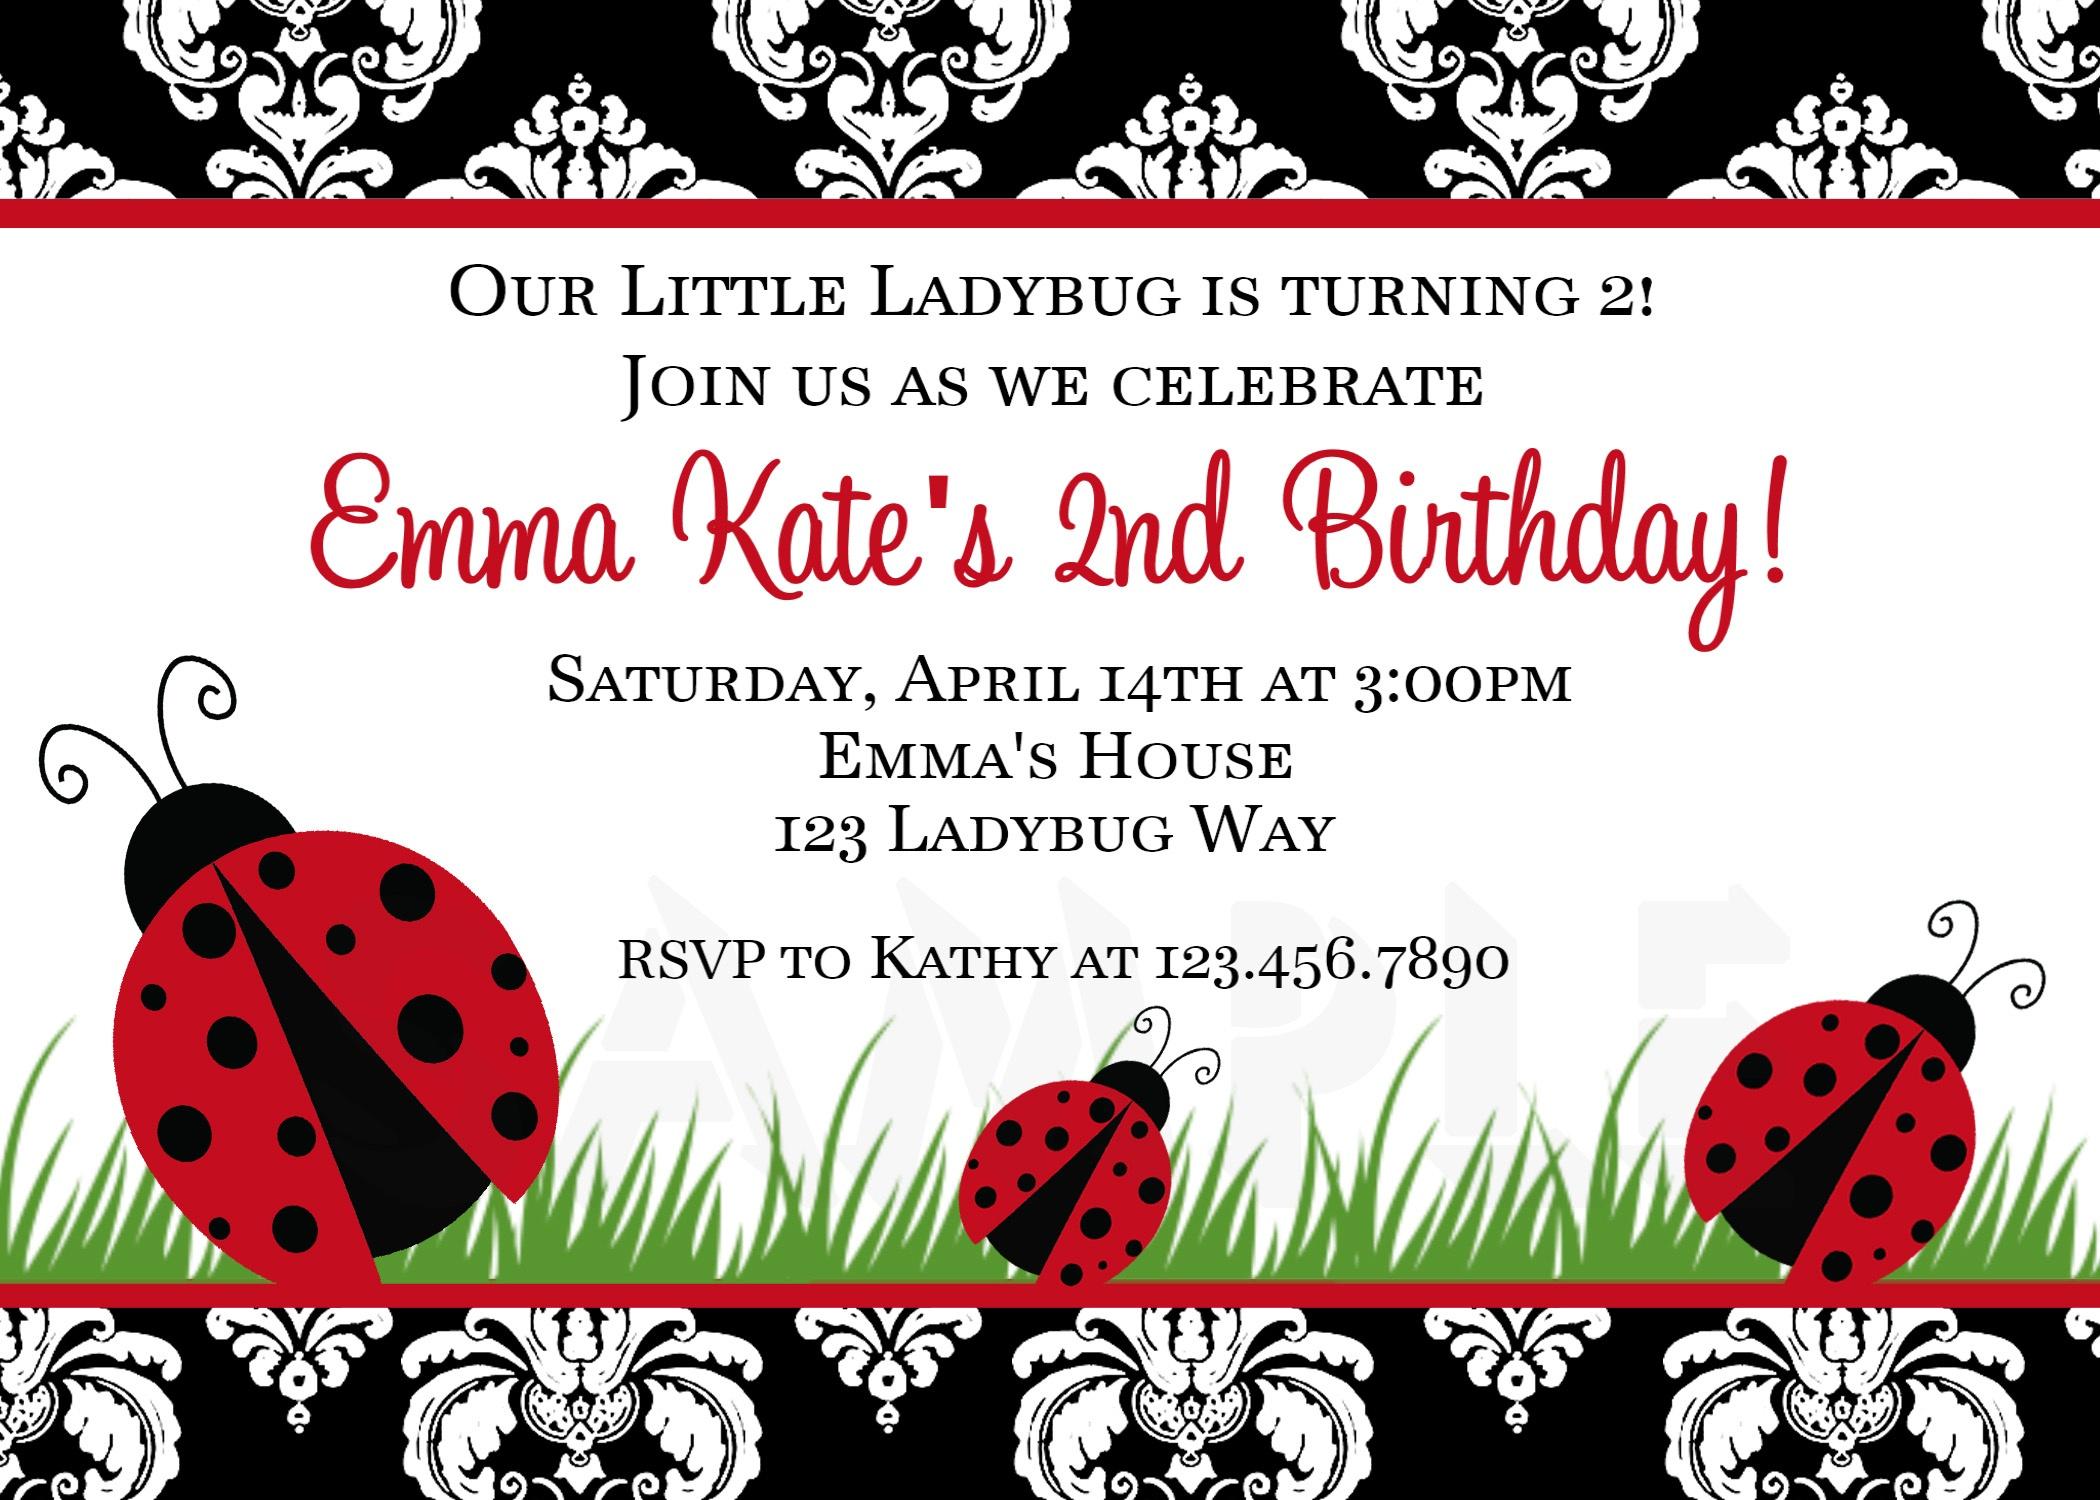 Photo : Printable Birthday Invitations Ladybug Image - Free Printable Ladybug Invitations